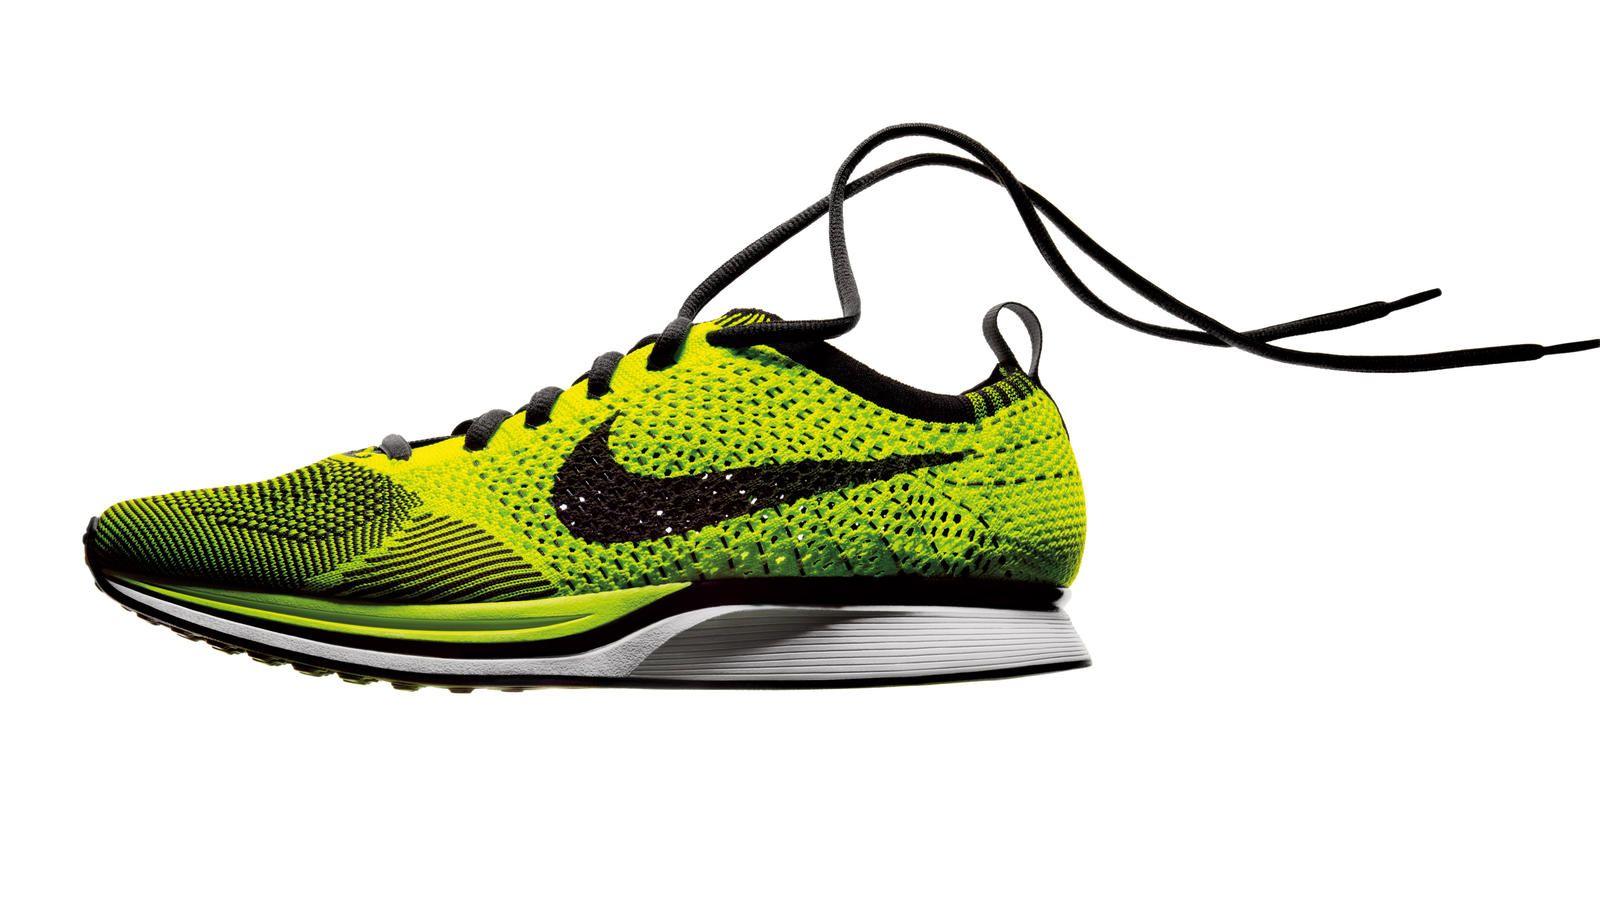 4b80e86372c8 Nike News - NIKE engineers knit for performance